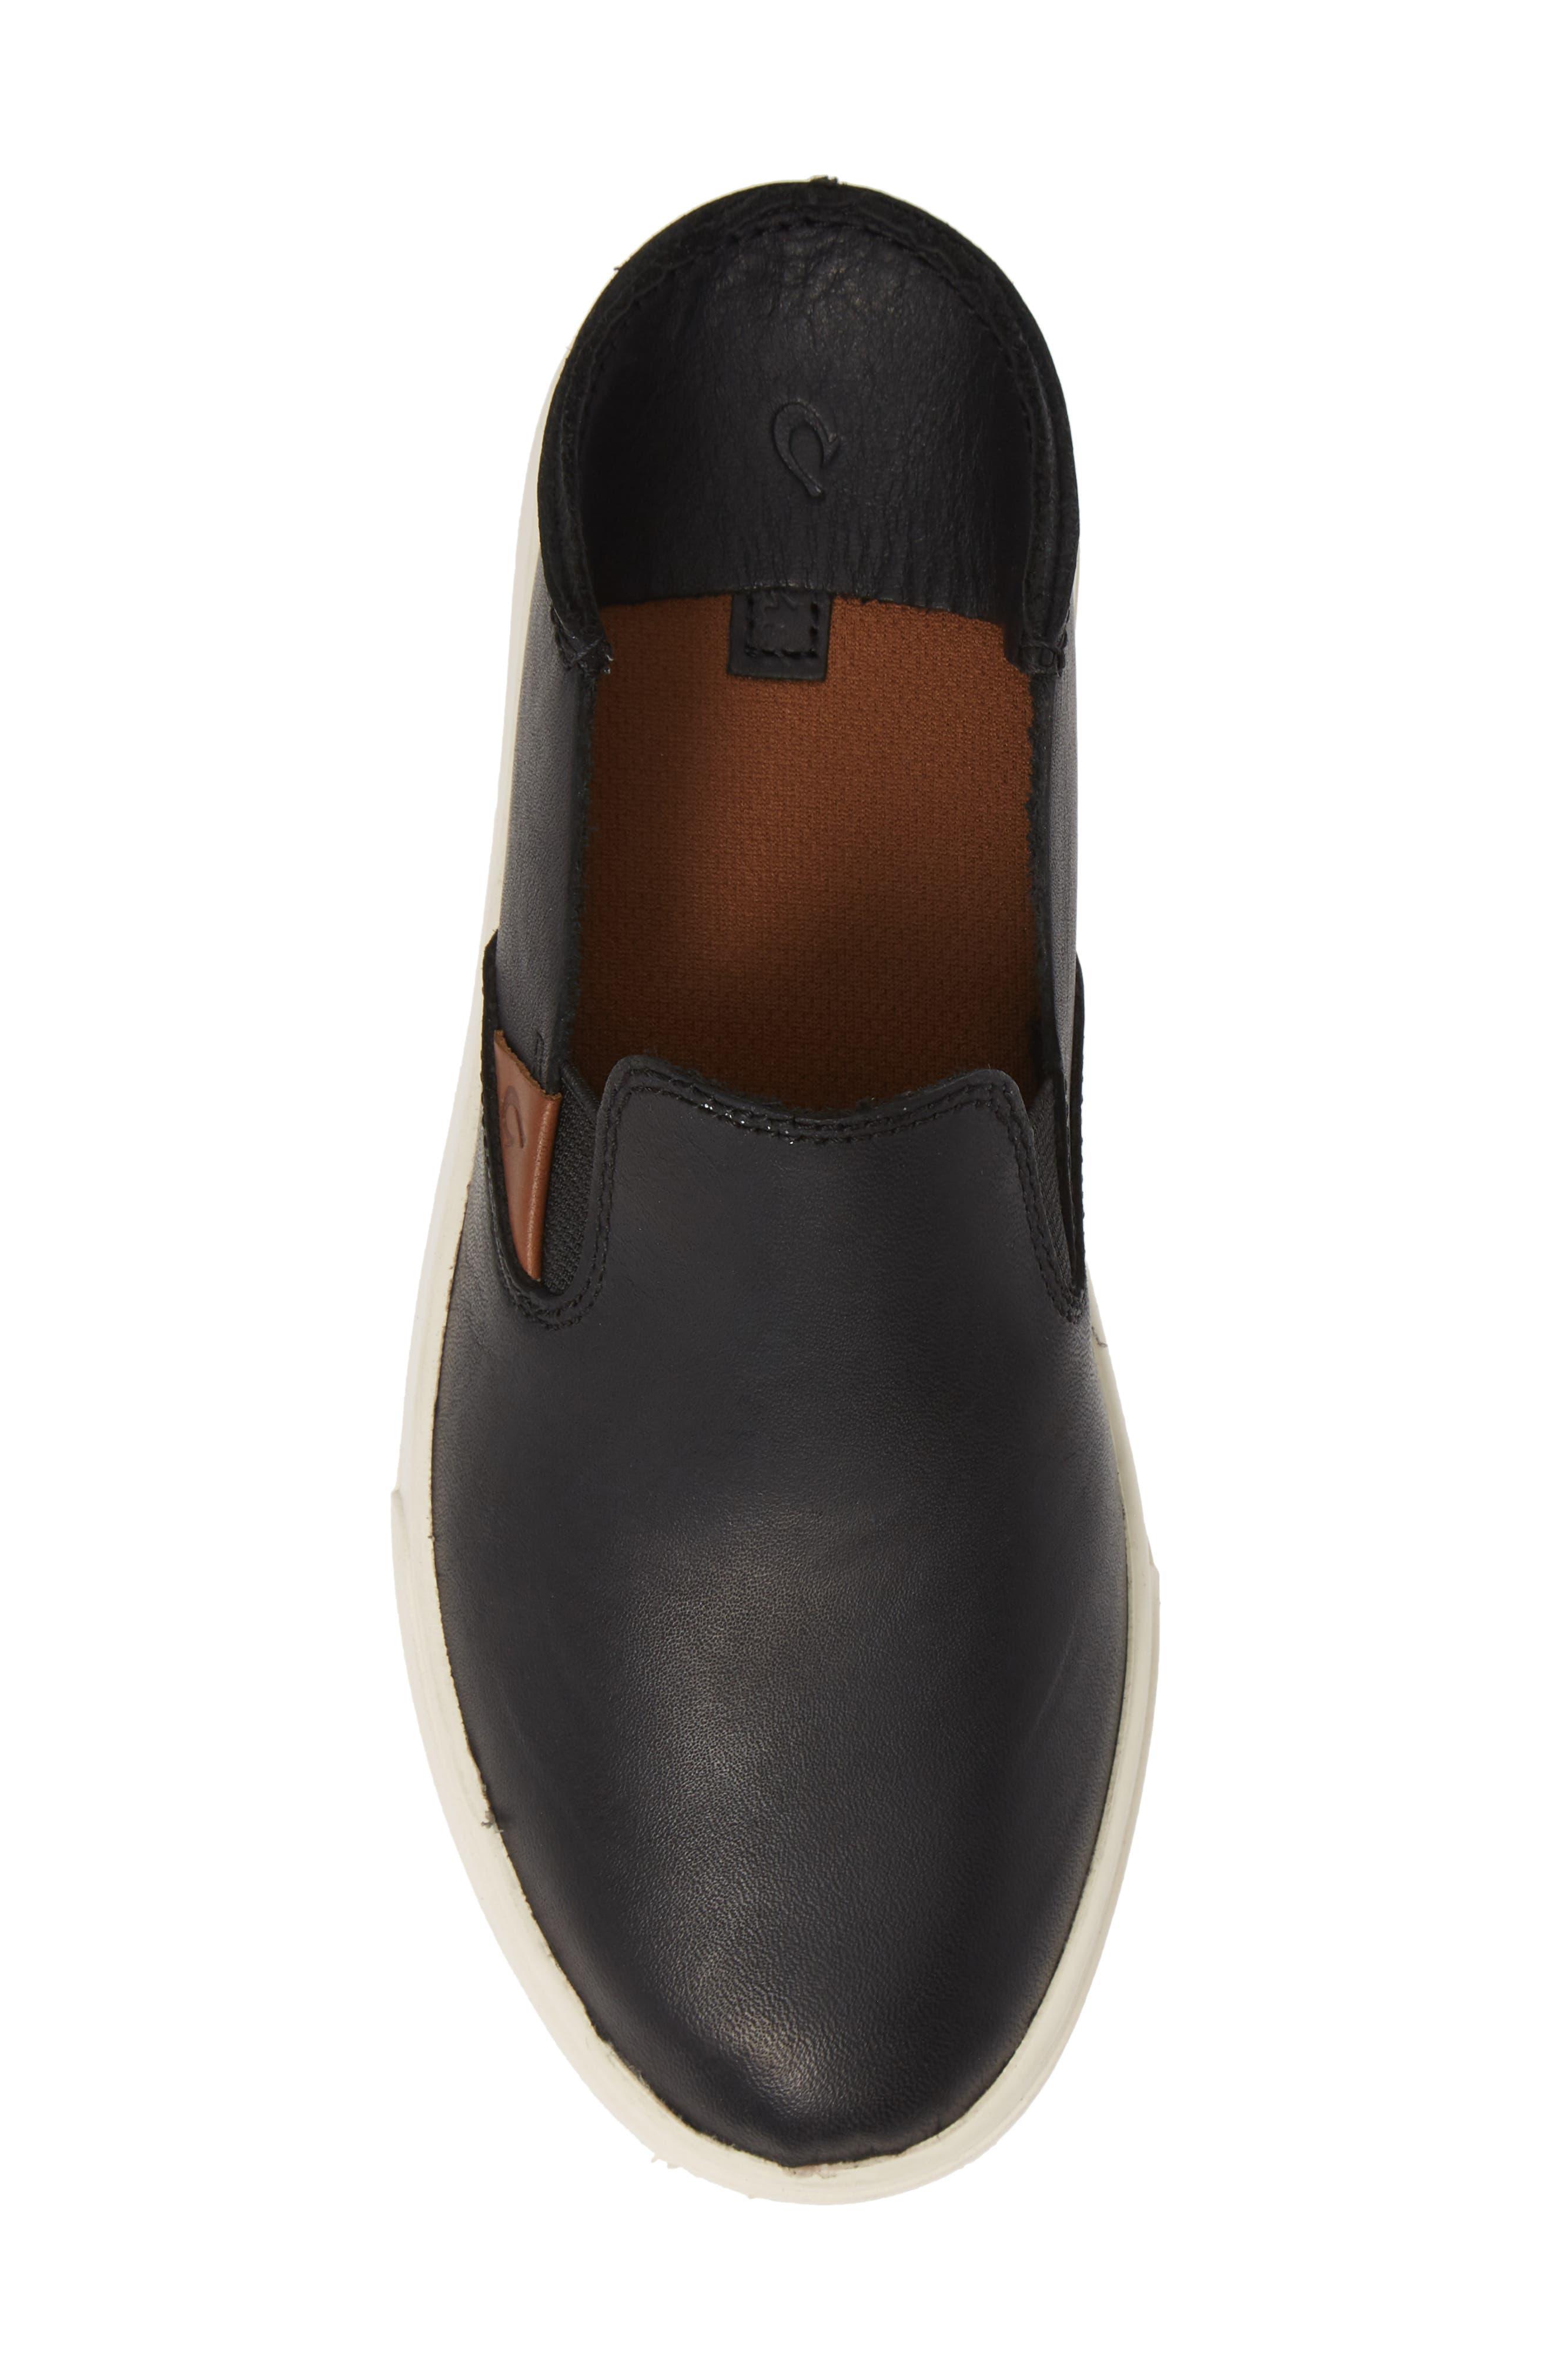 Pehuea Slip-On Sneaker,                             Alternate thumbnail 6, color,                             BLACK/ BLACK LEATHER